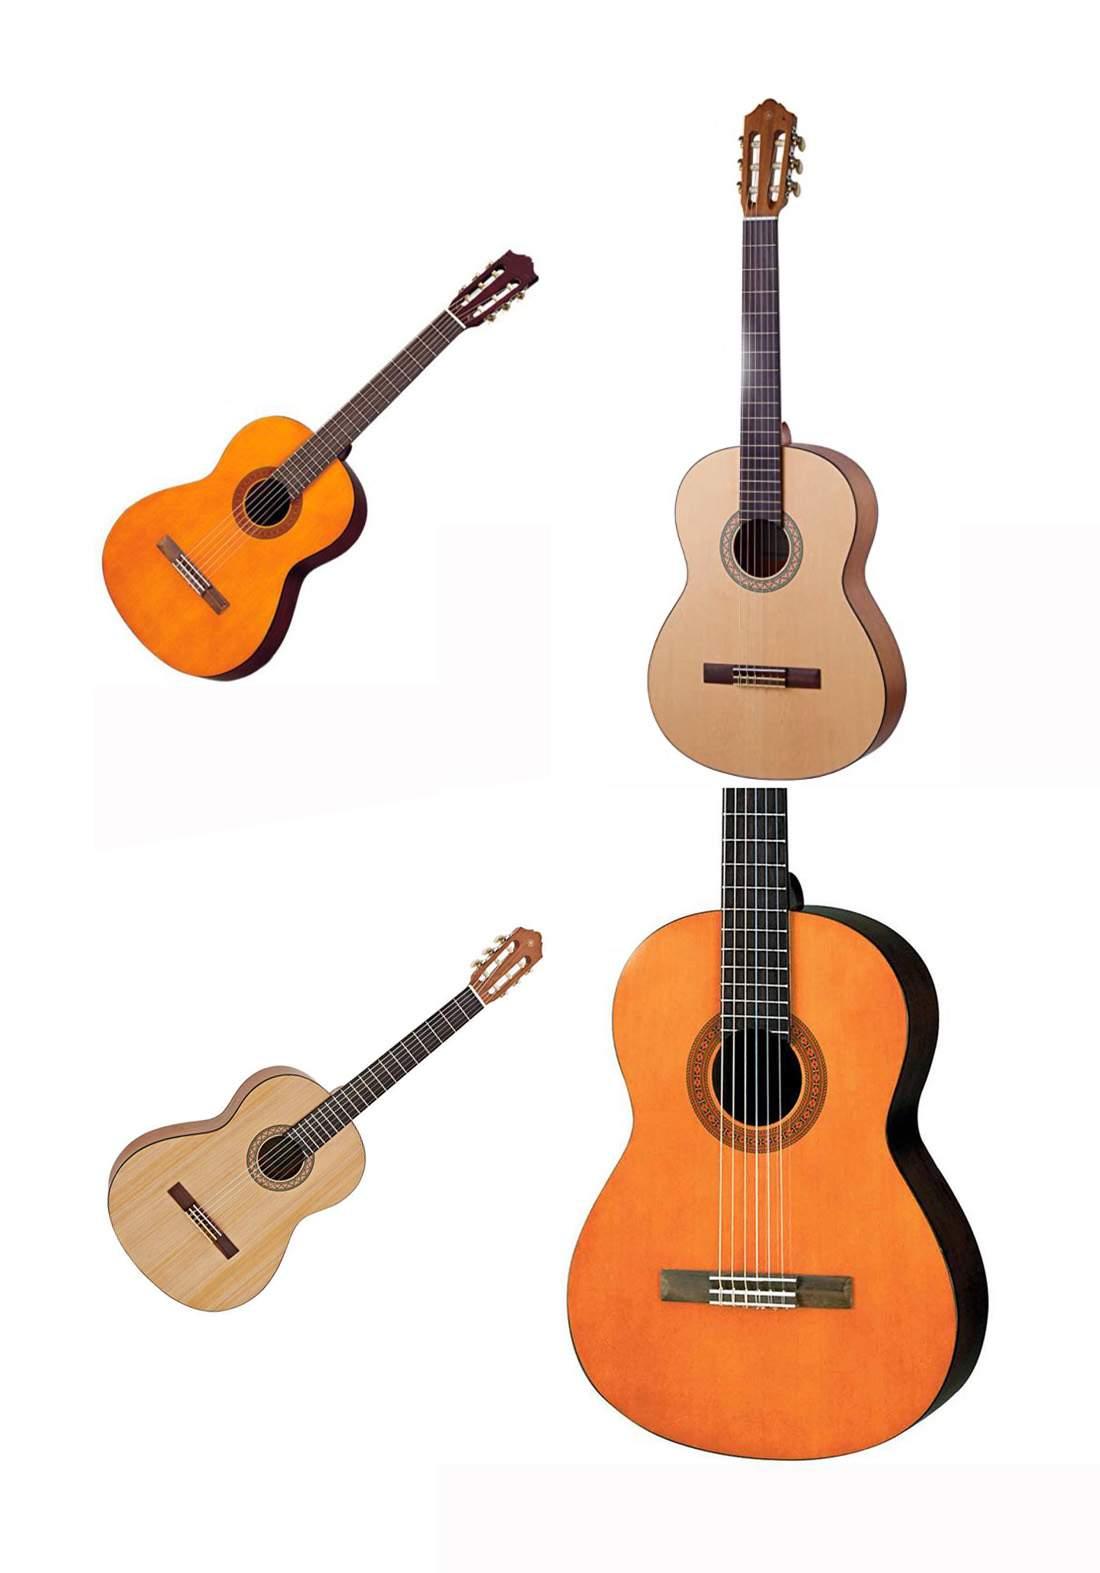 Yamaha Classic Guitar C40 - جيتار كلاسك